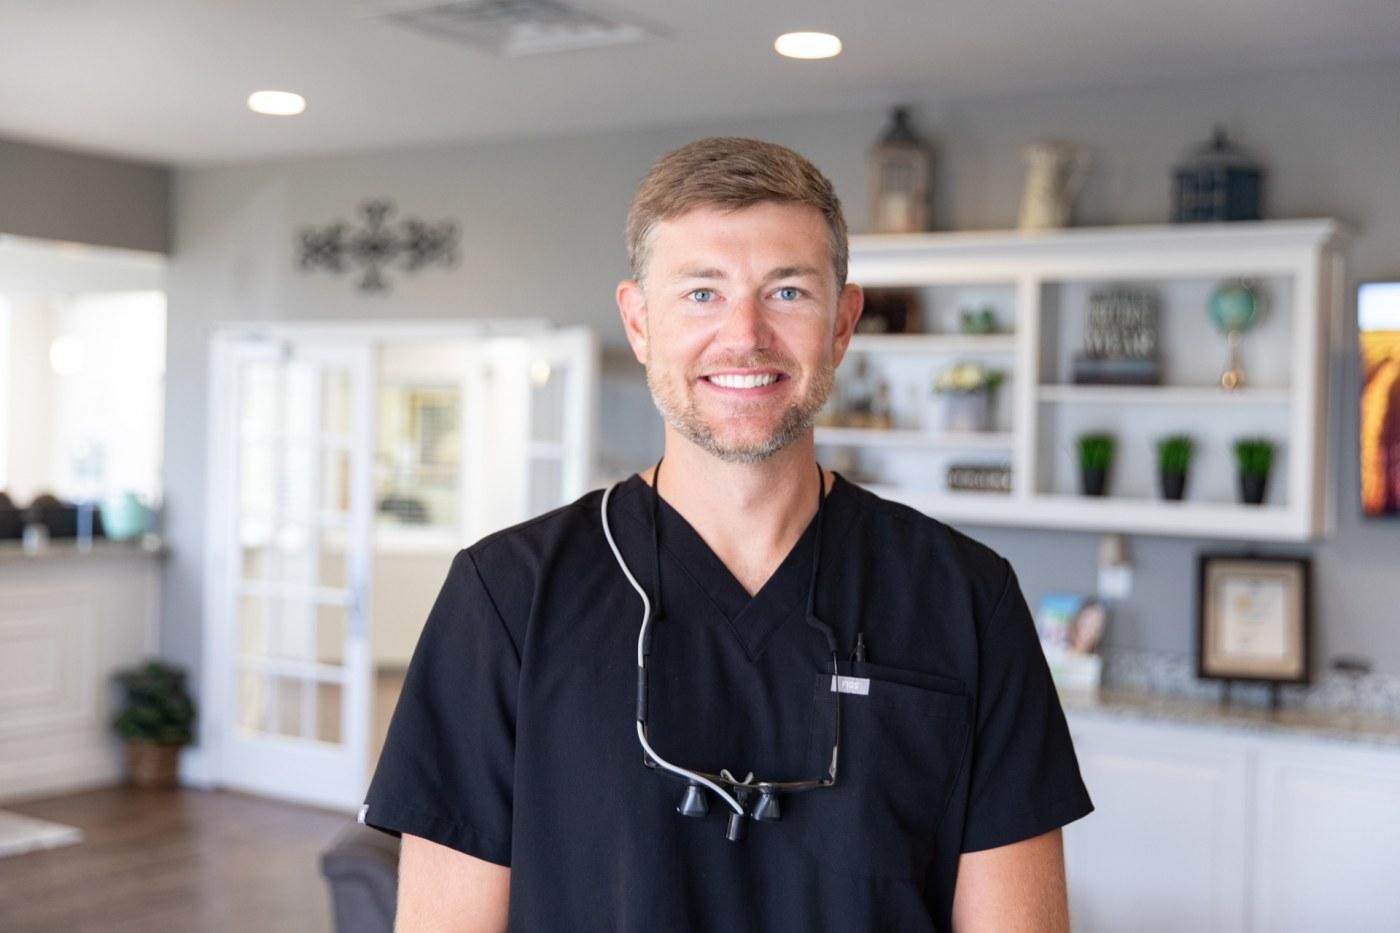 Dr. MacWilliam of StoneCreek Dental Care